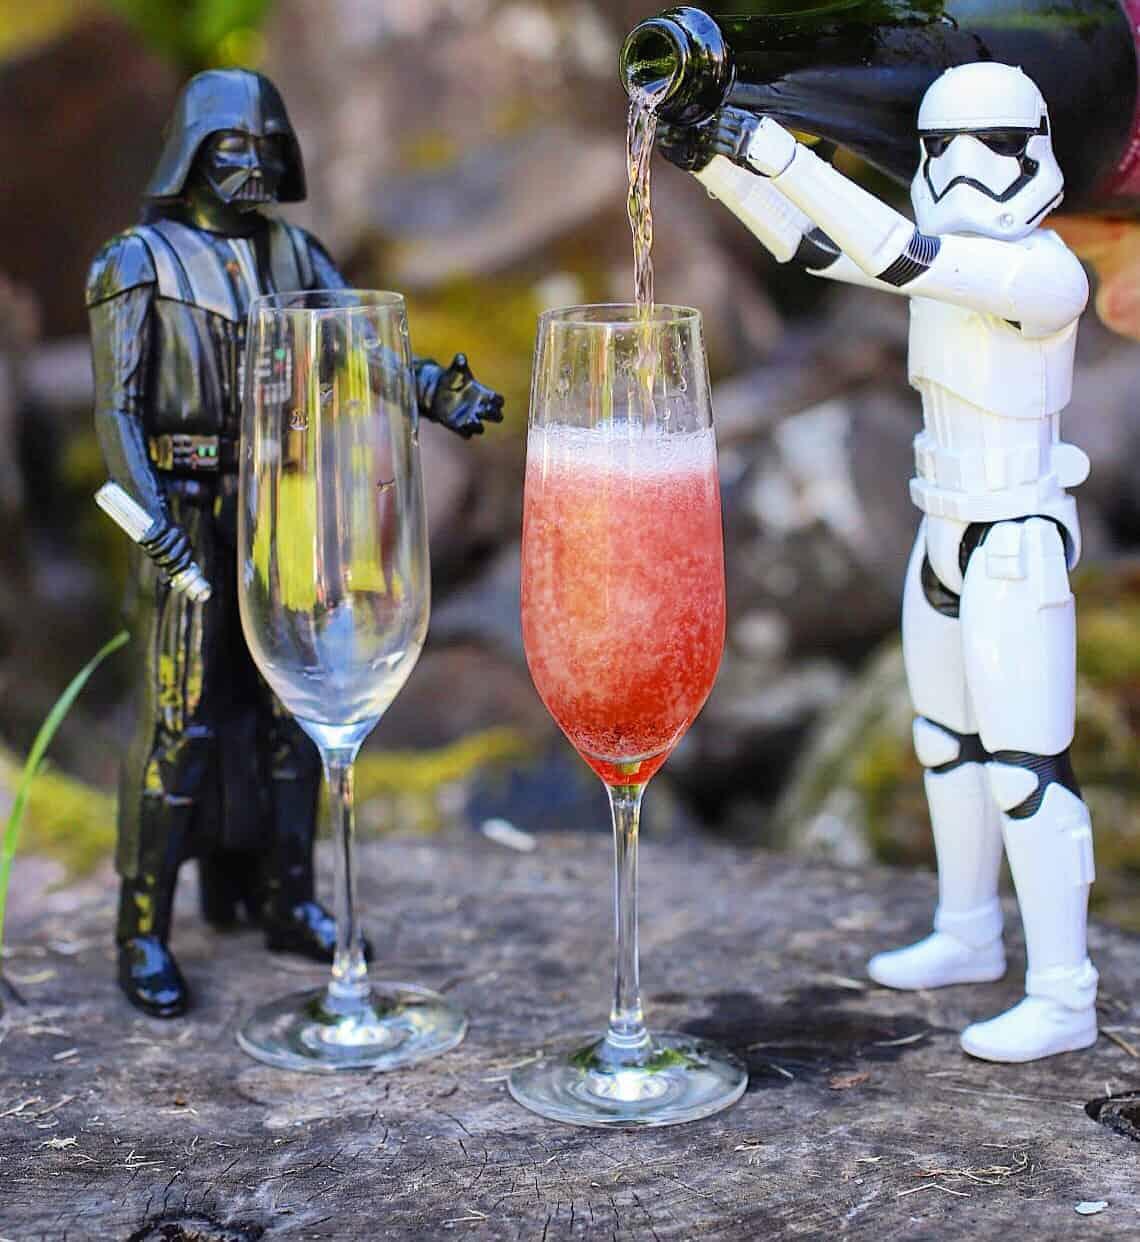 Celebrating, Star Wars Style